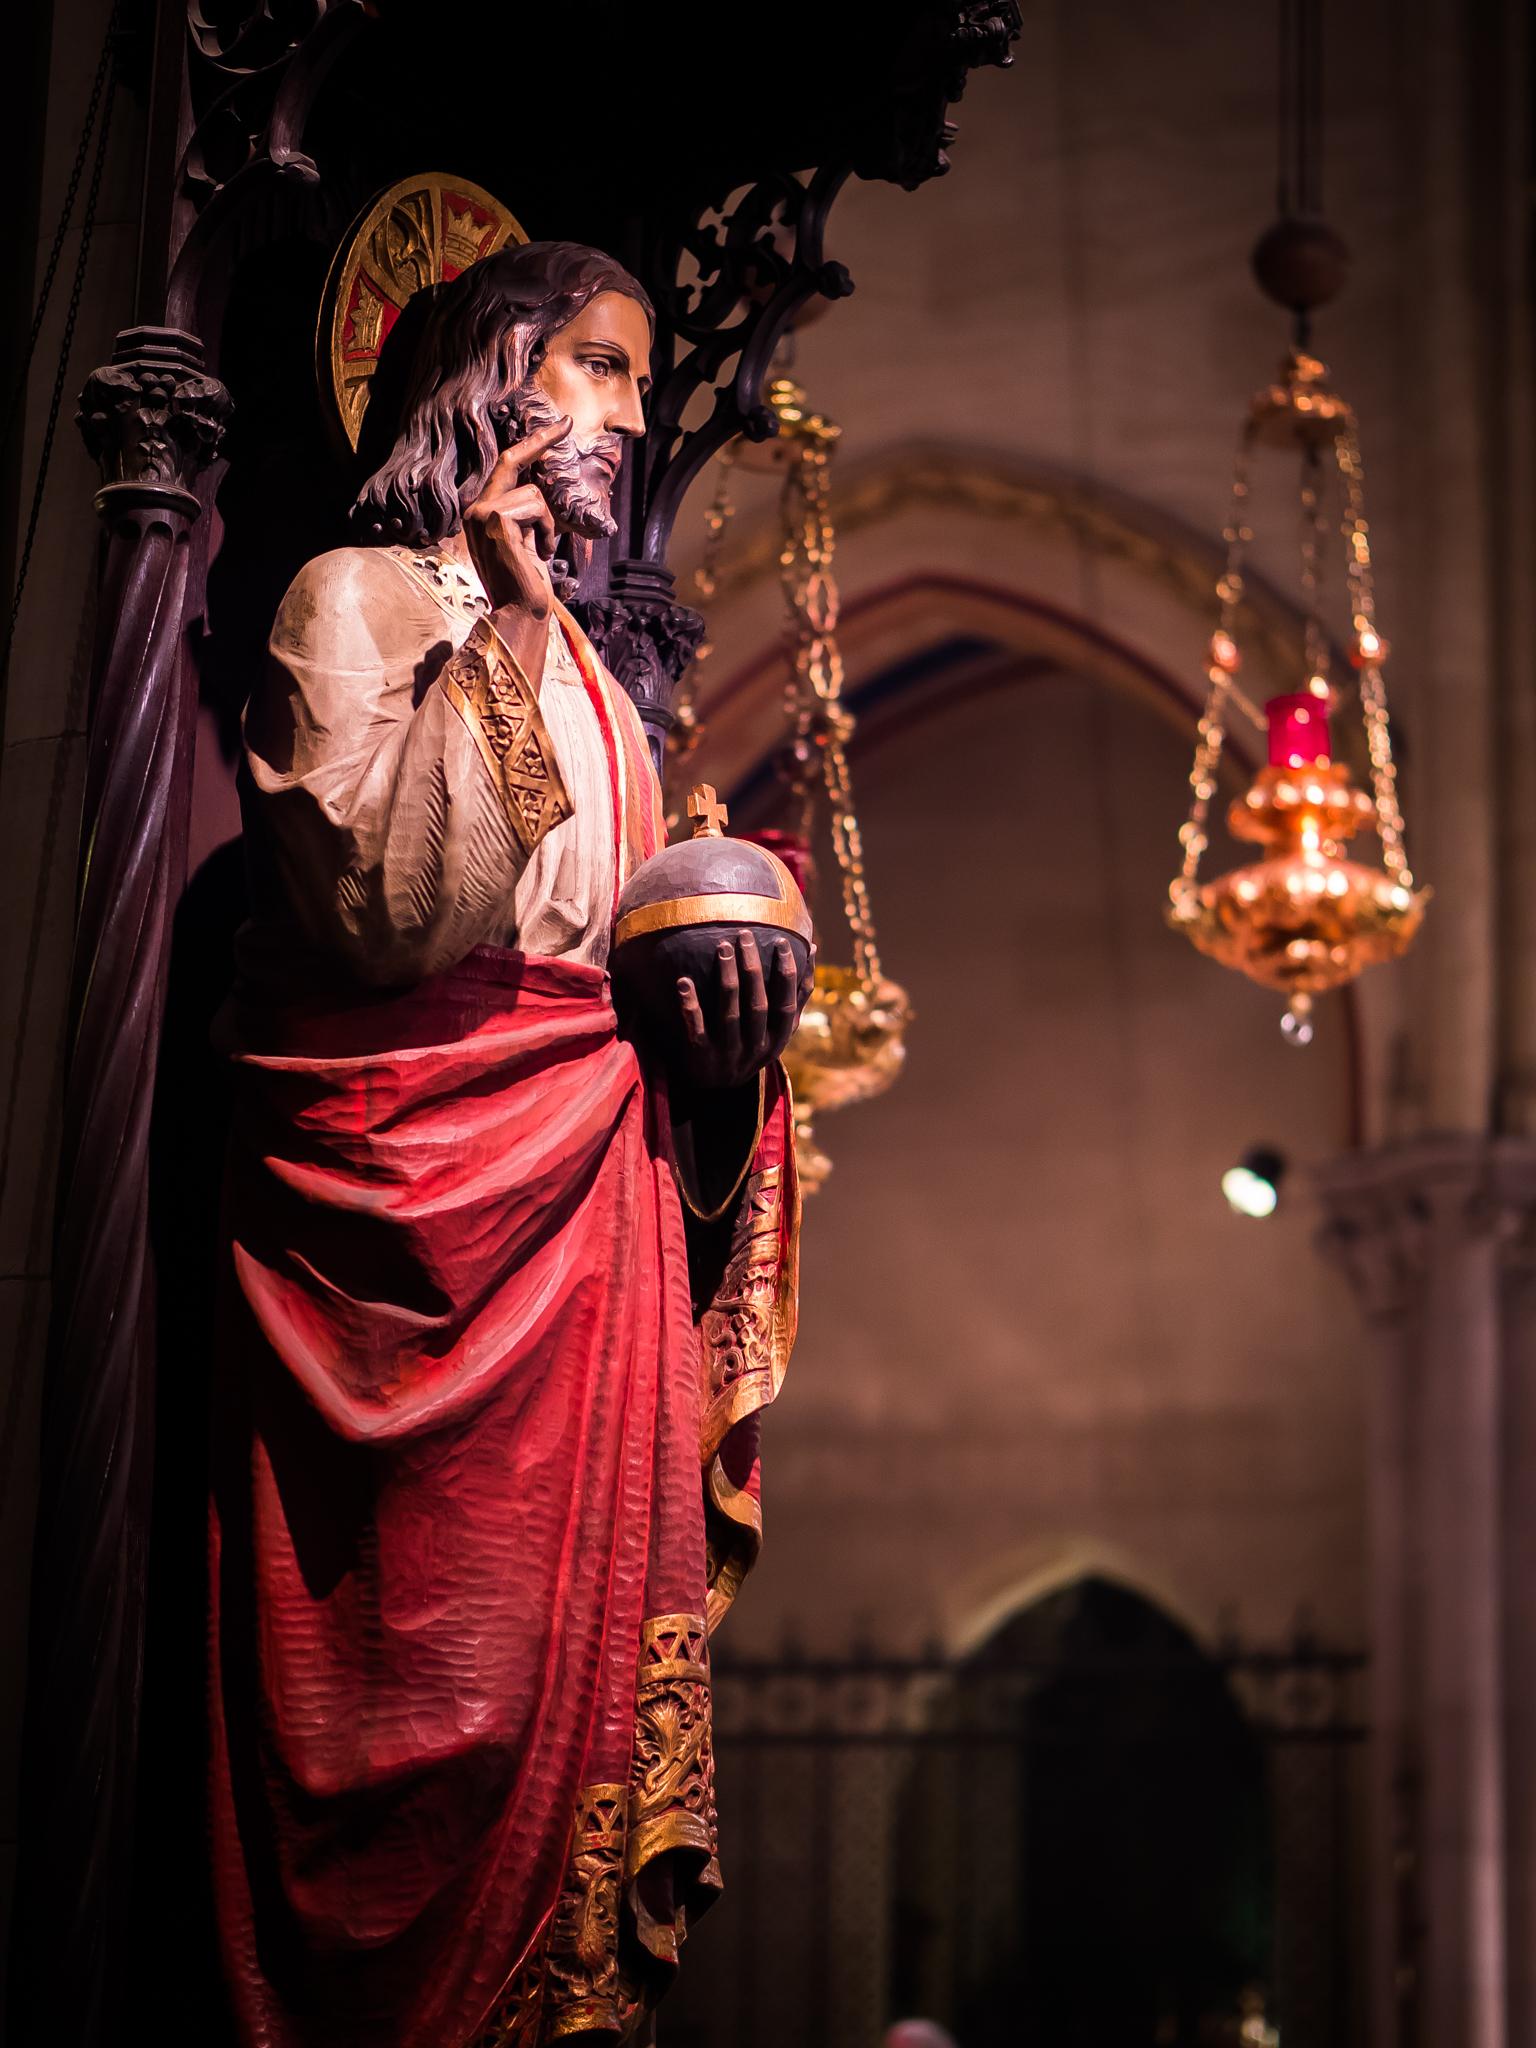 The Shrine of Christ the King   By Joannes Kirchmayer (1860-1930)  Photo by Ricardo Gomez